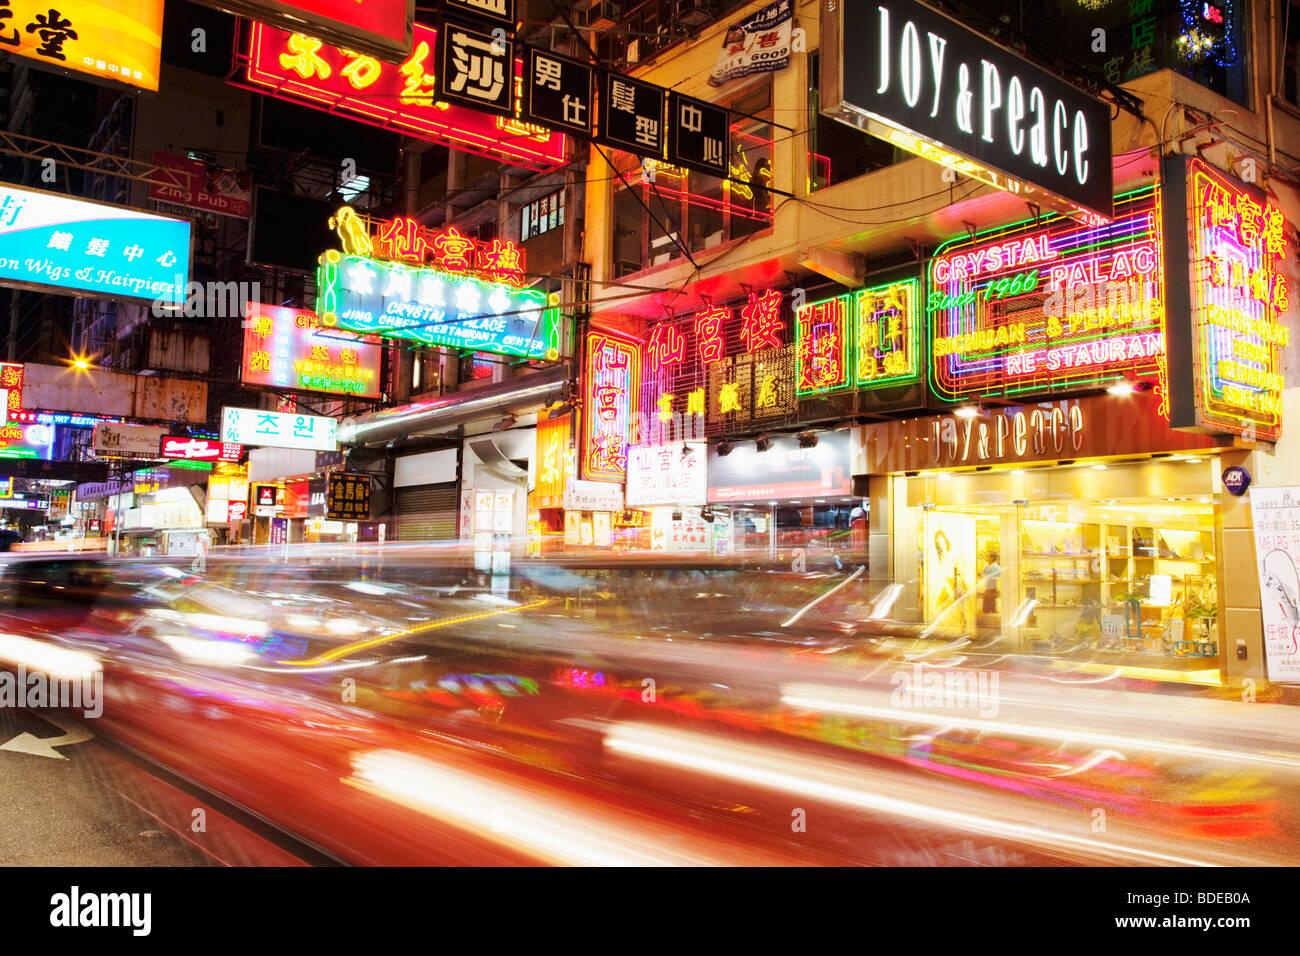 Enseignes au néon et lumière voiture trail à Tsim Sha Tsui, Kowloon, Hong Kong, Chine. Photo Stock